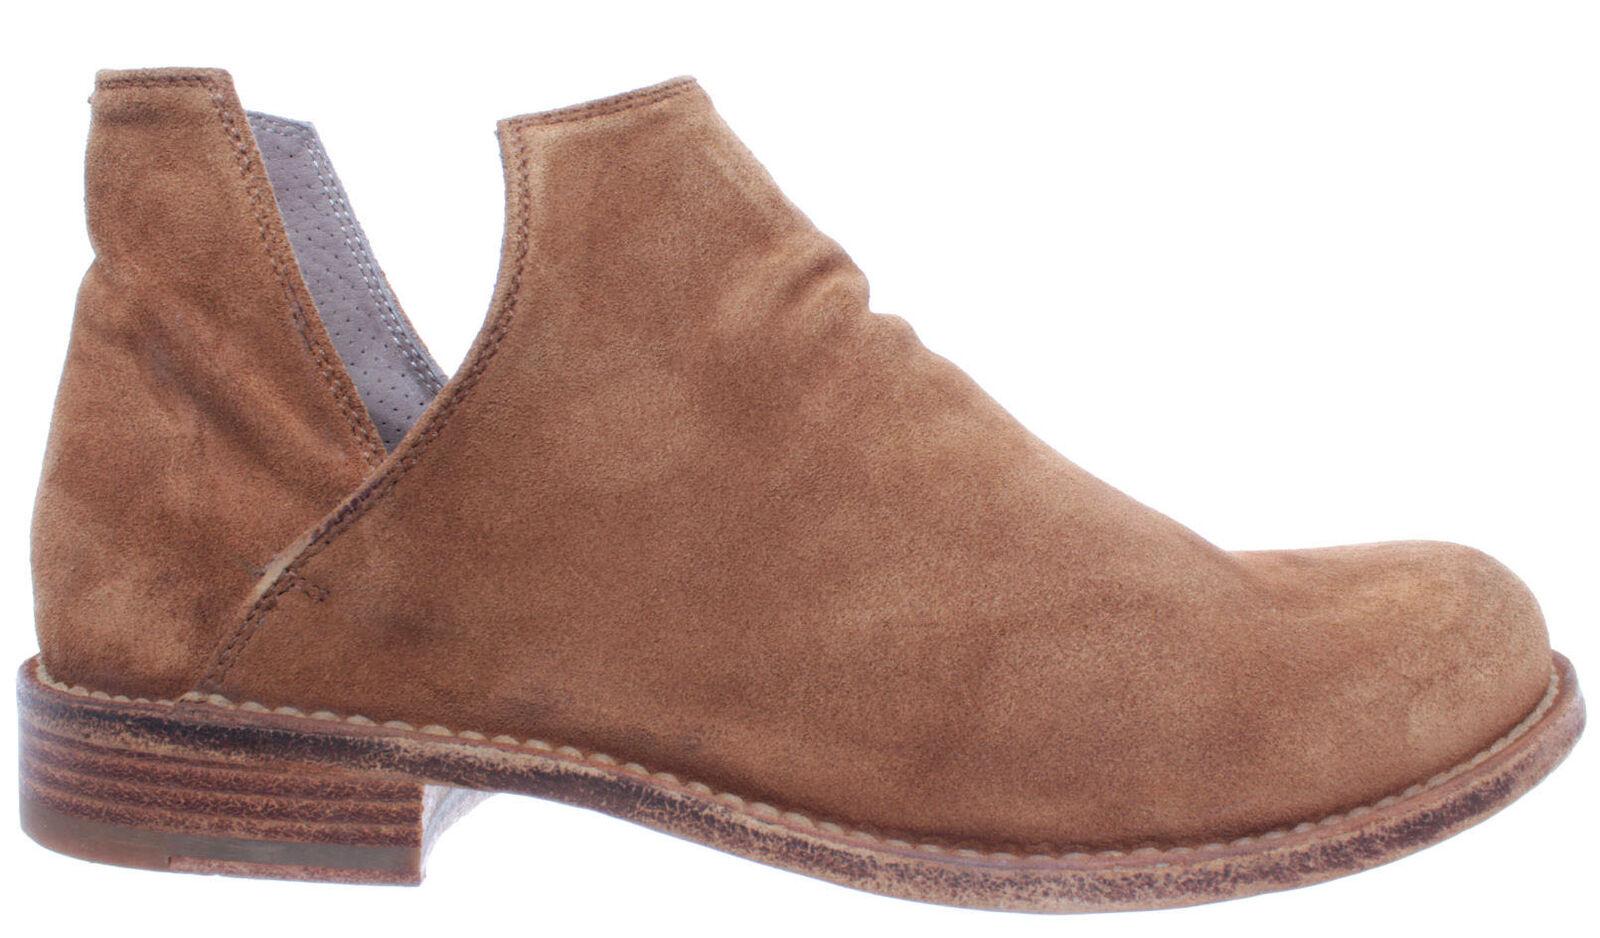 Officine Creative zapatos señora botines Legrand 135 Softy cognac antelina